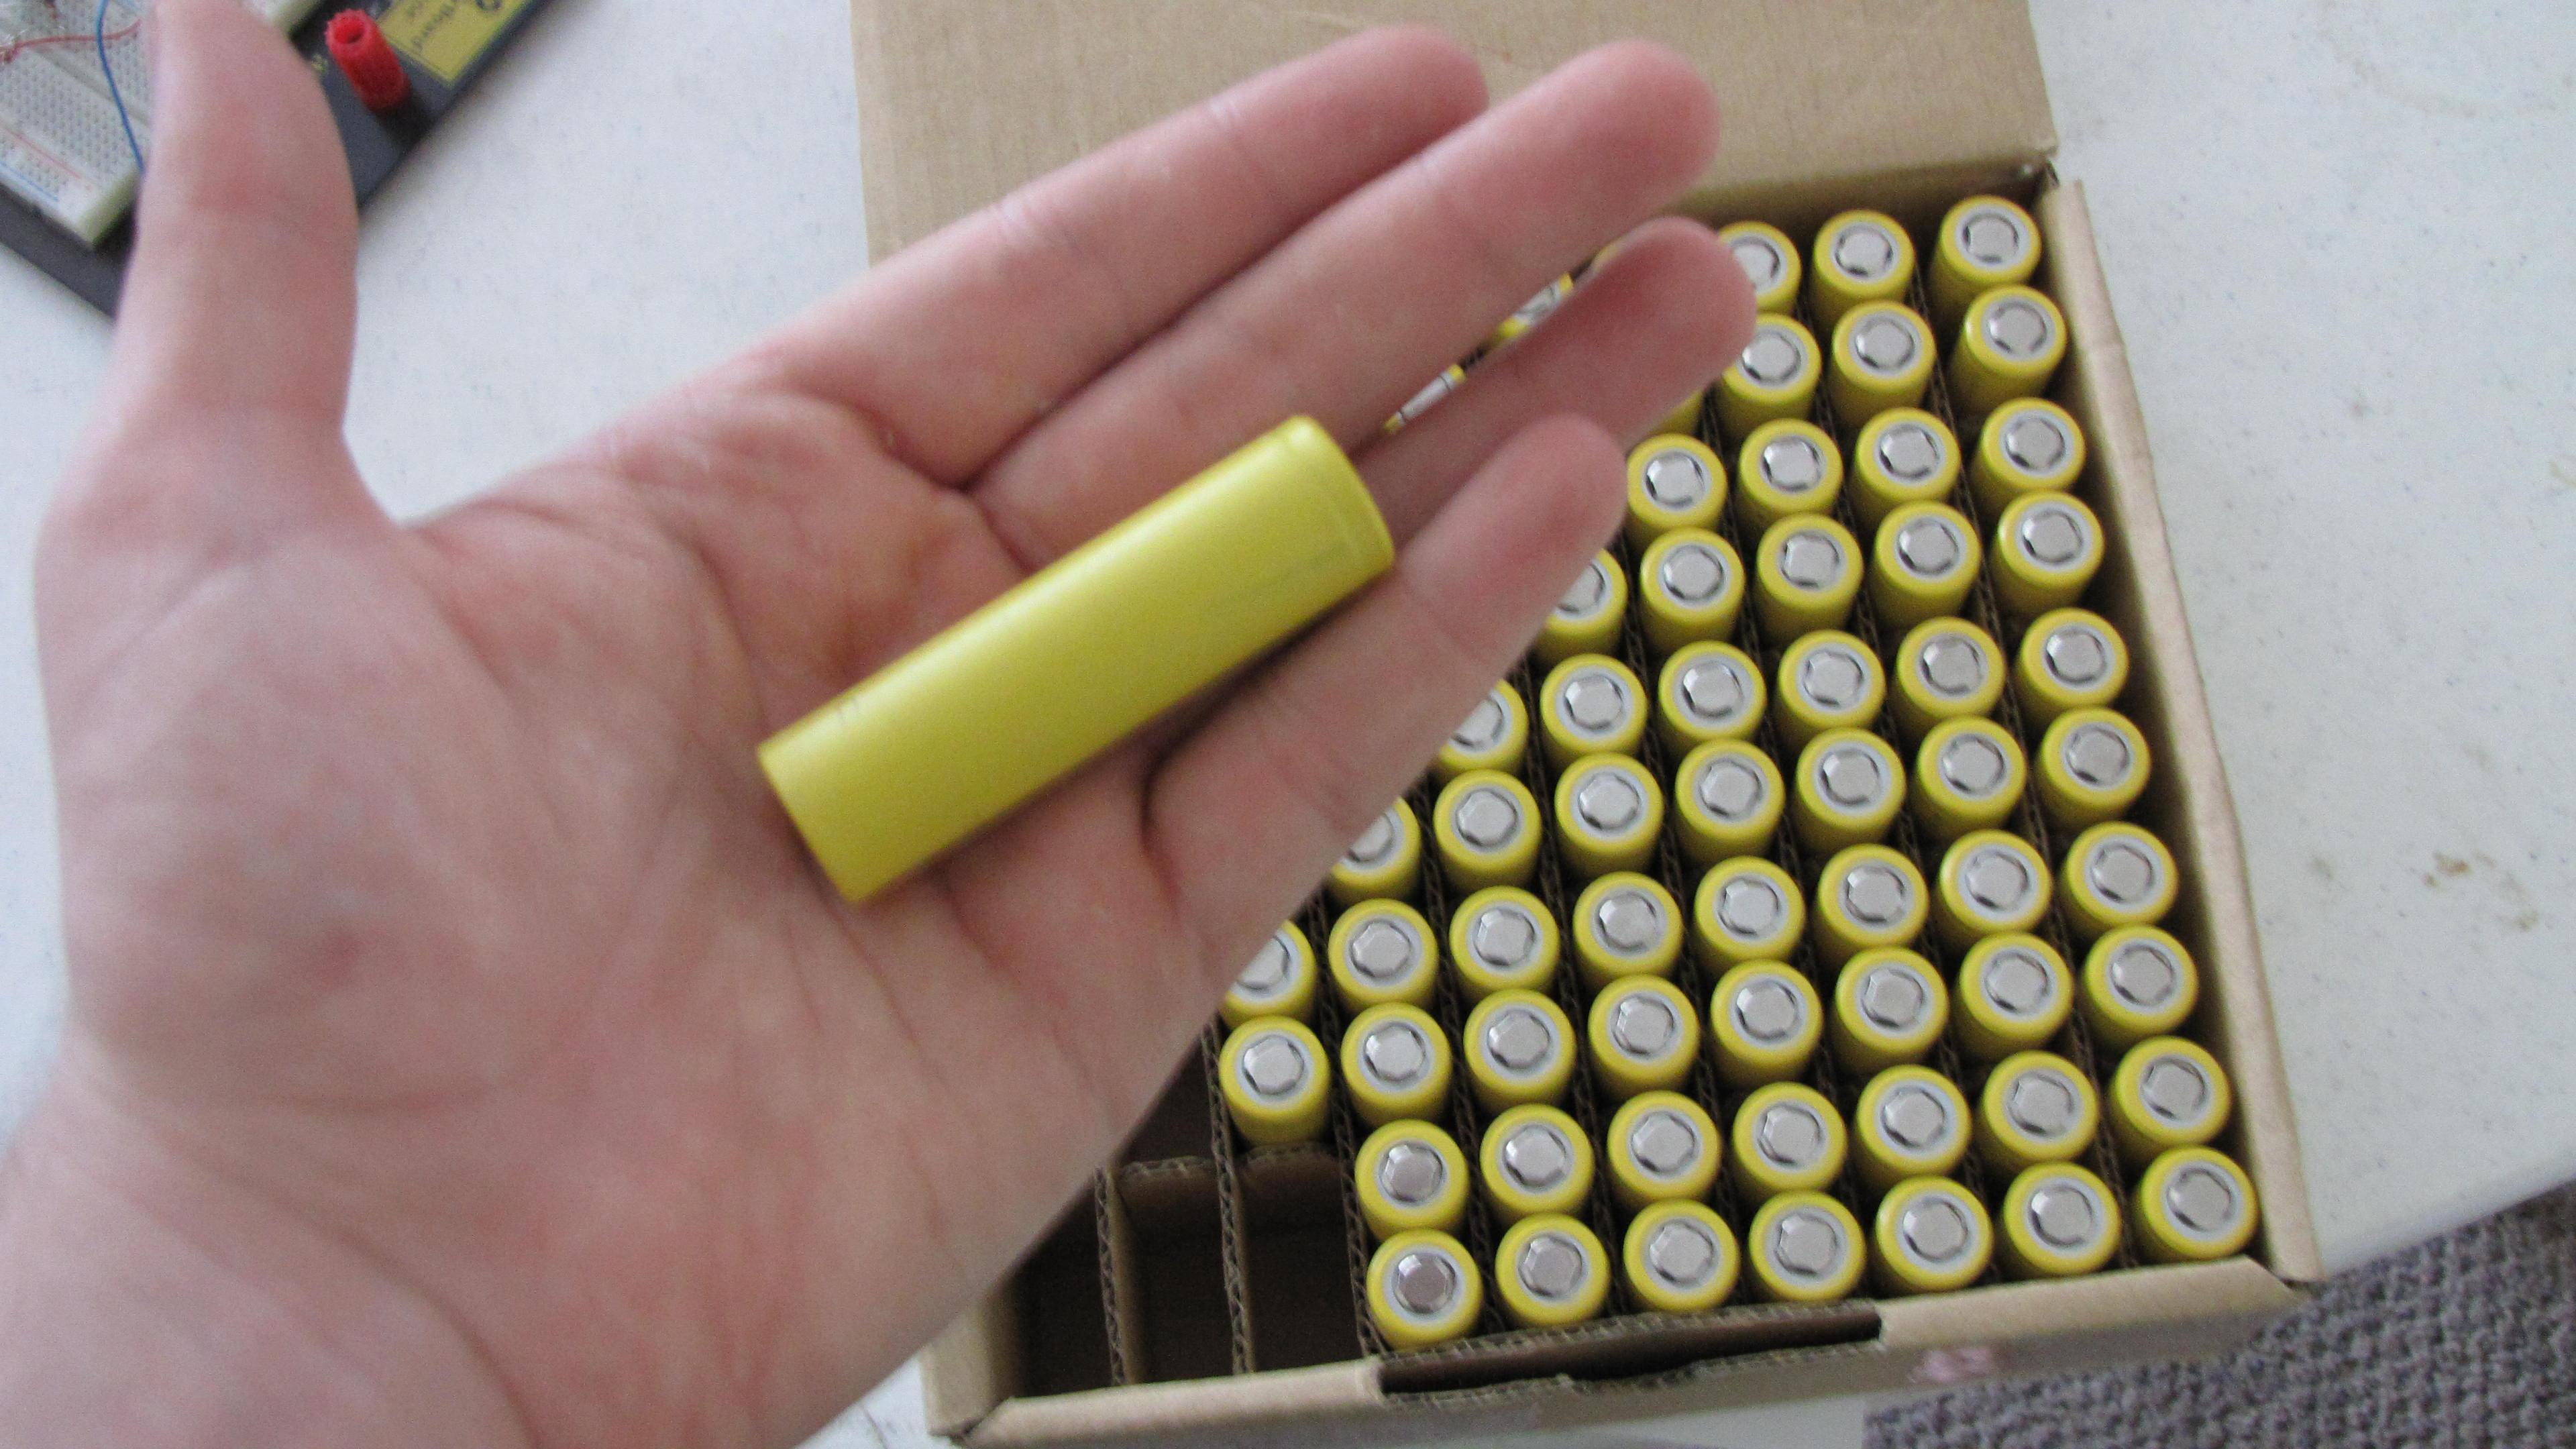 16650 A123 batteries